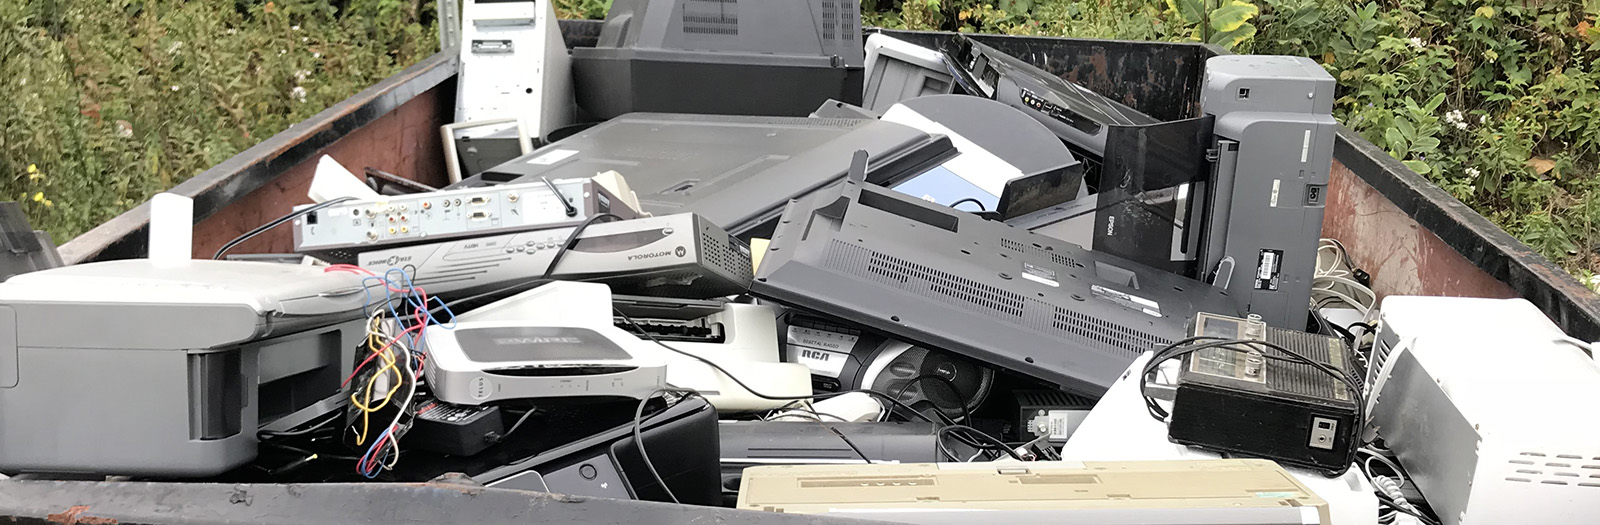 bin full of e-waste